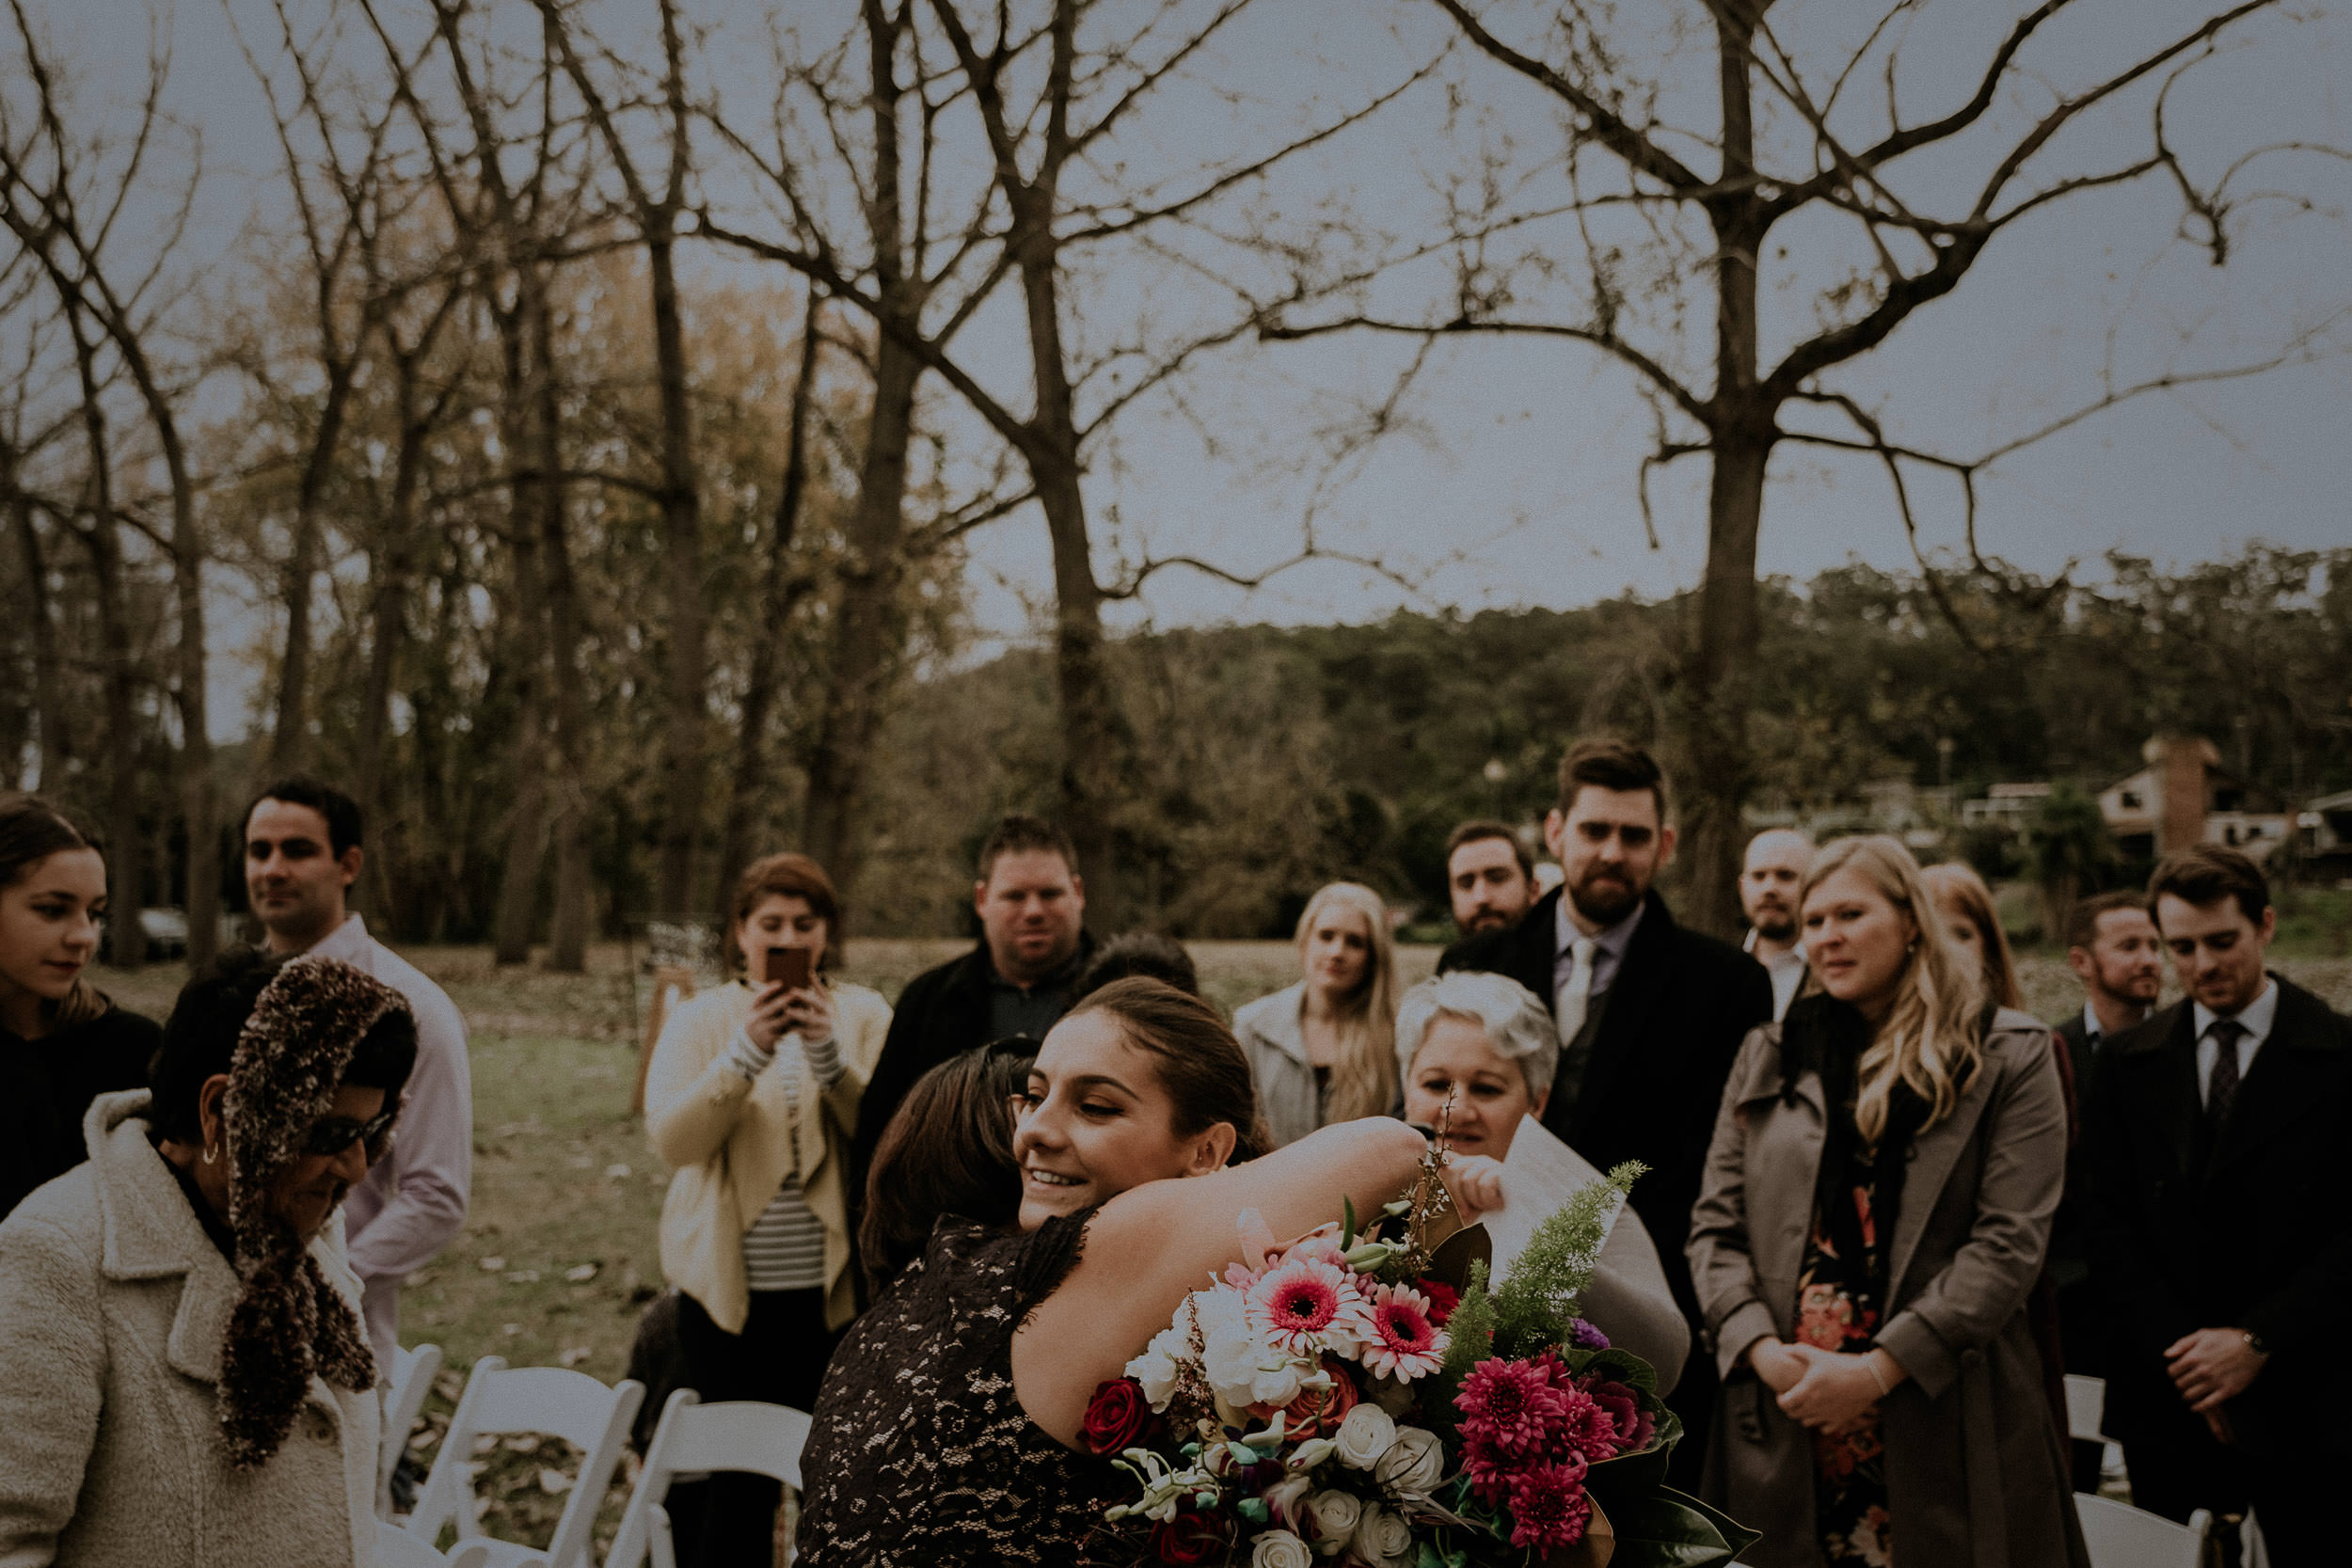 g_c wedding - kings _ thieves elopement wedding photography - blog 22.jpg